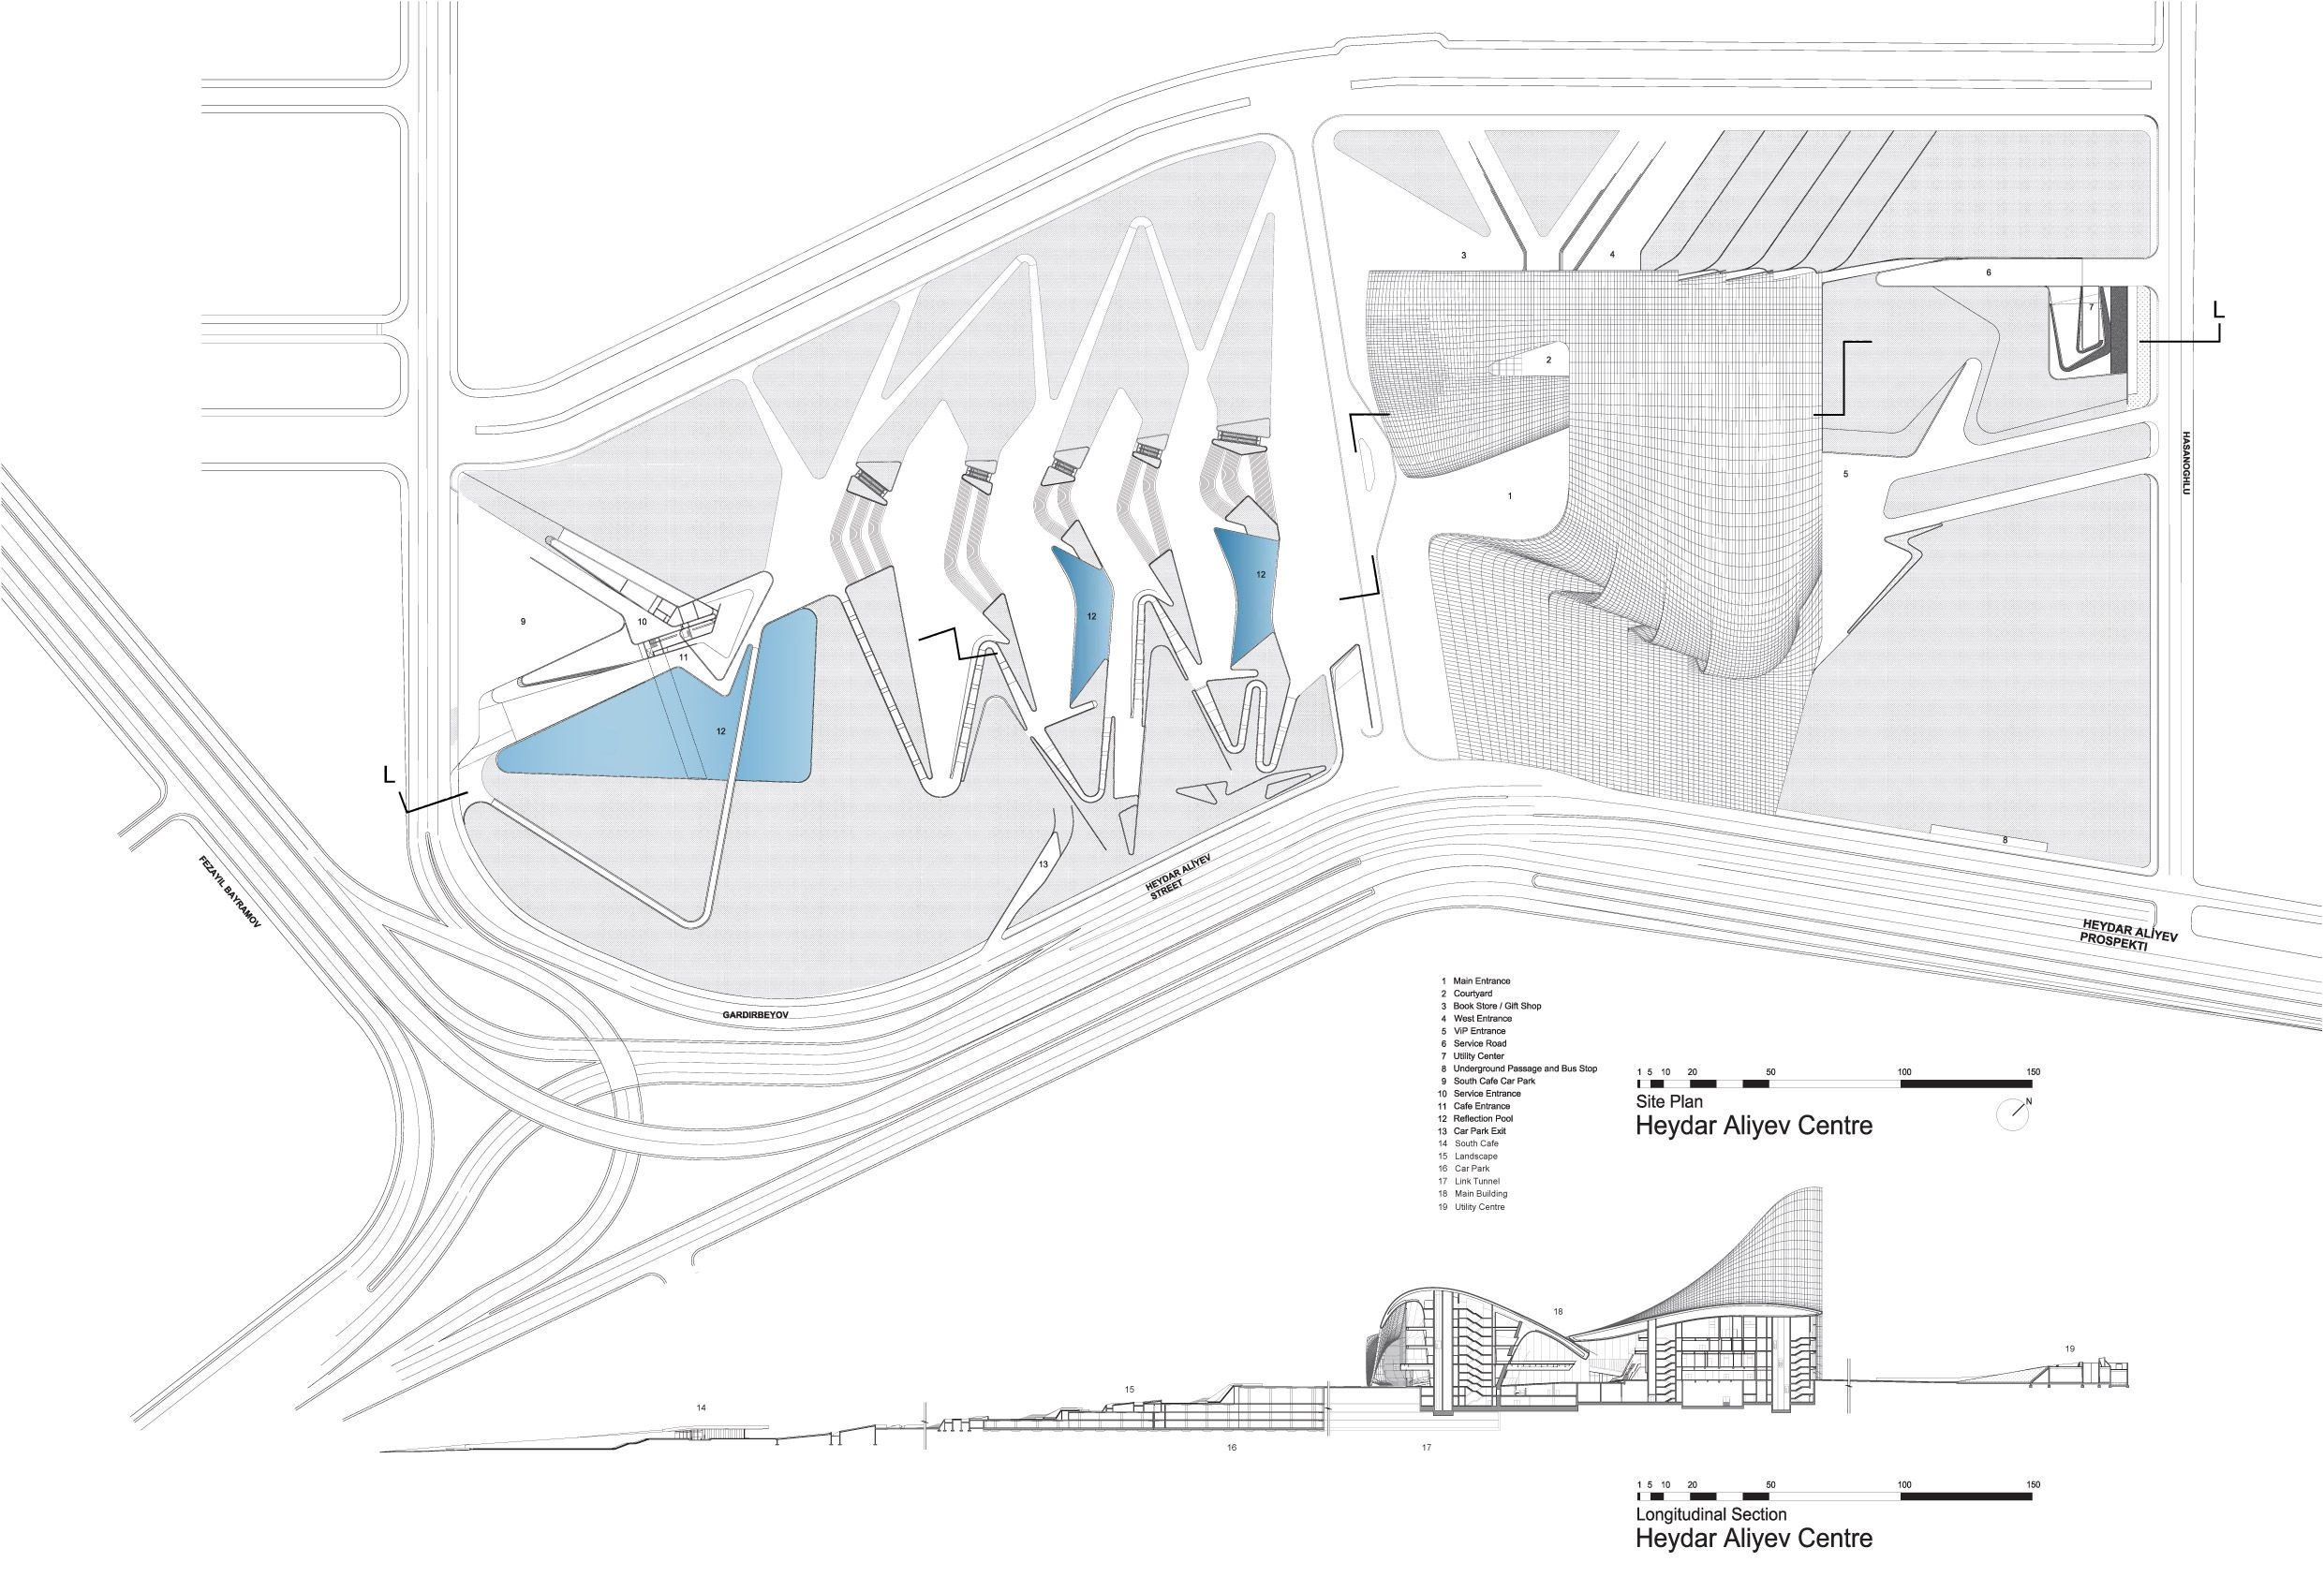 Architecture · Nomination   Architecture: Heydar Aliyev Centre, Zaha Hadid  ...